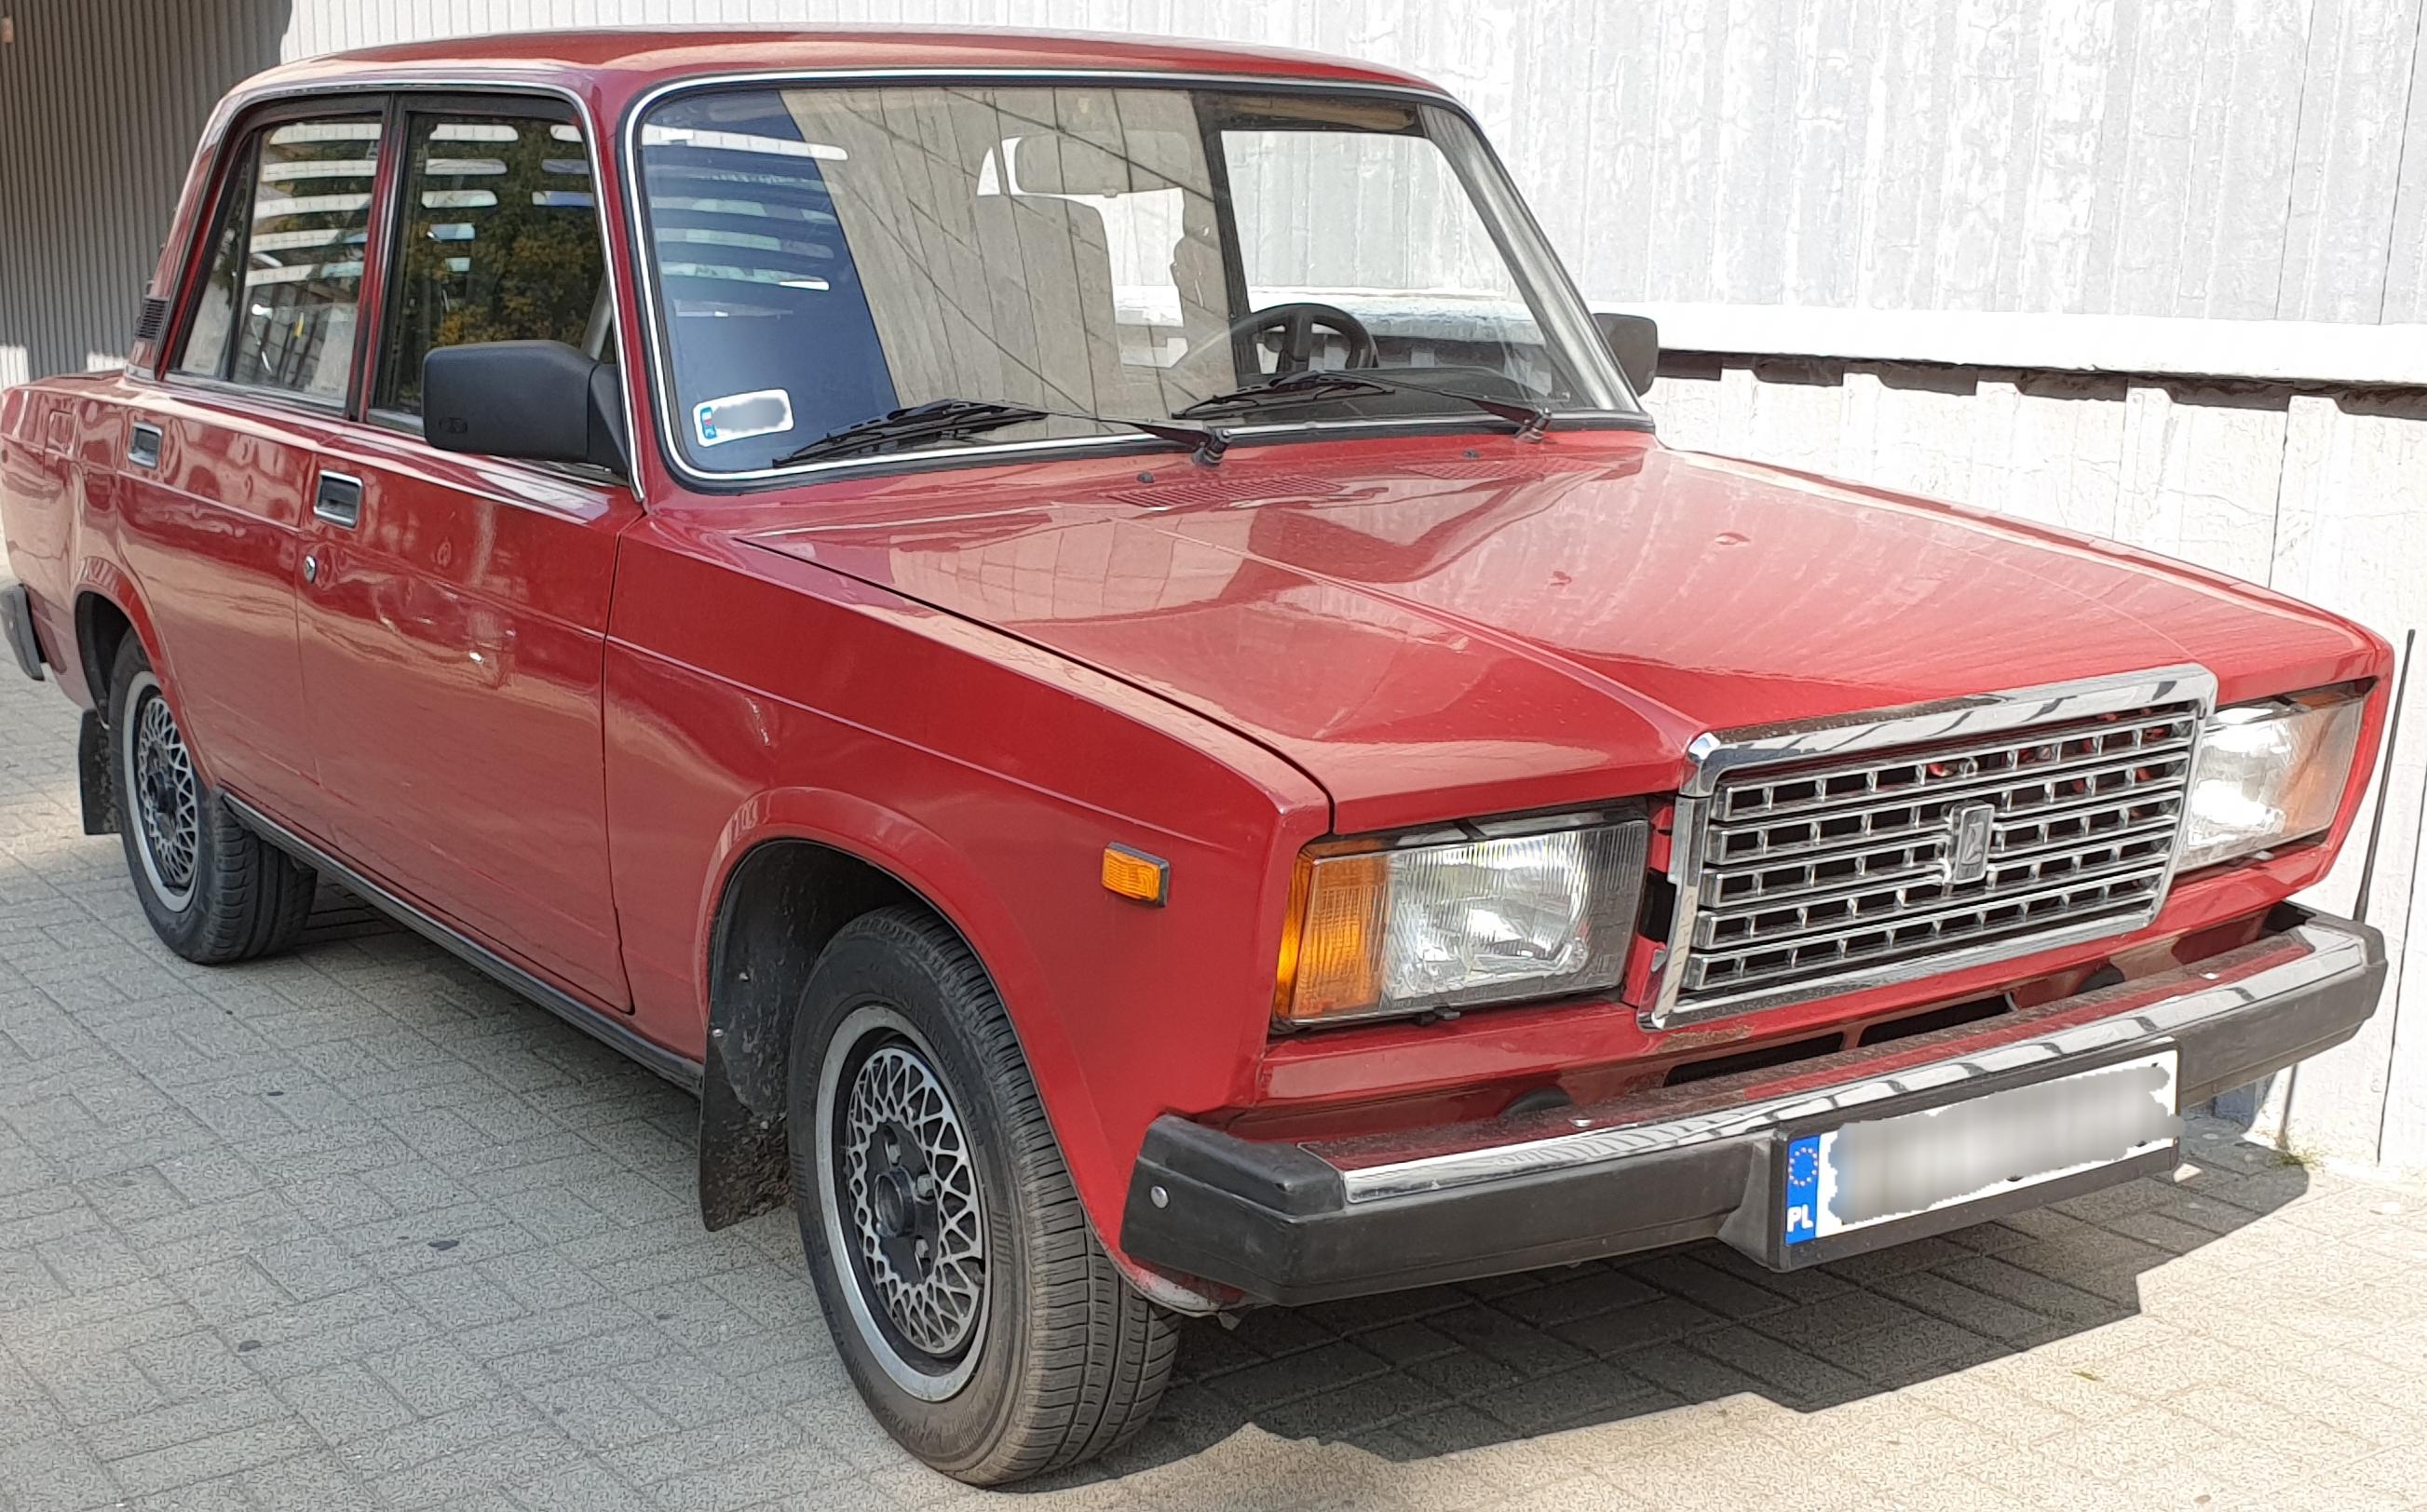 File:Lada 2107 (VAZ-2107) 01.jpg